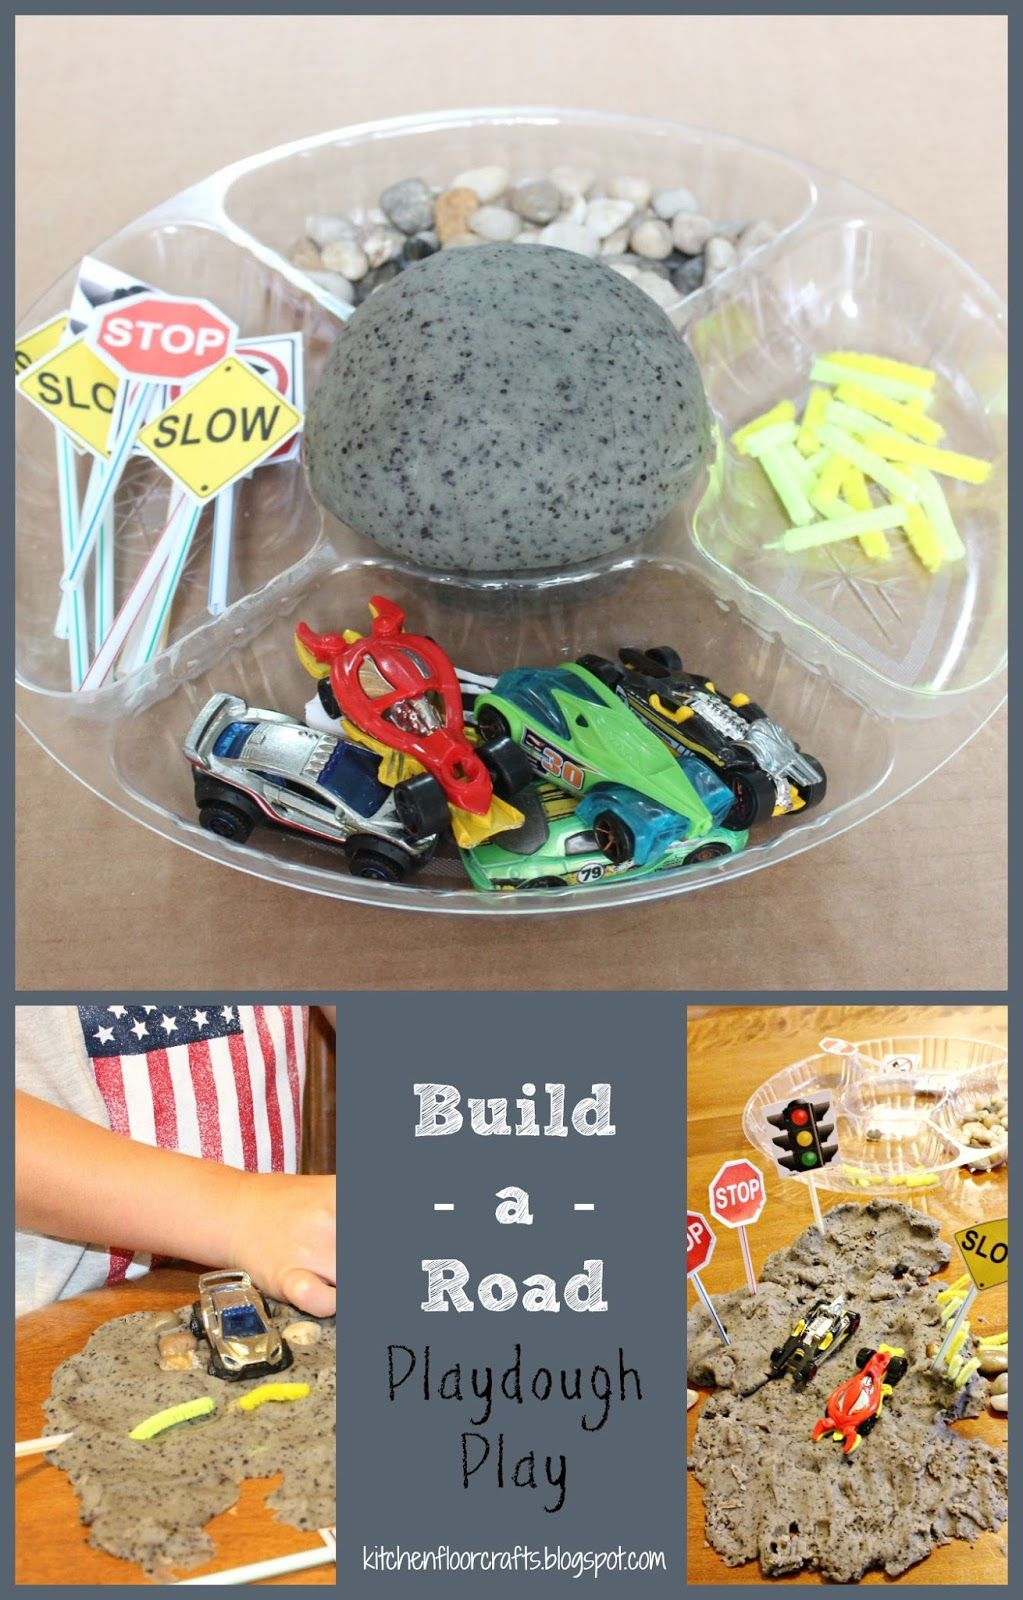 Build-A-Road Playdough Play